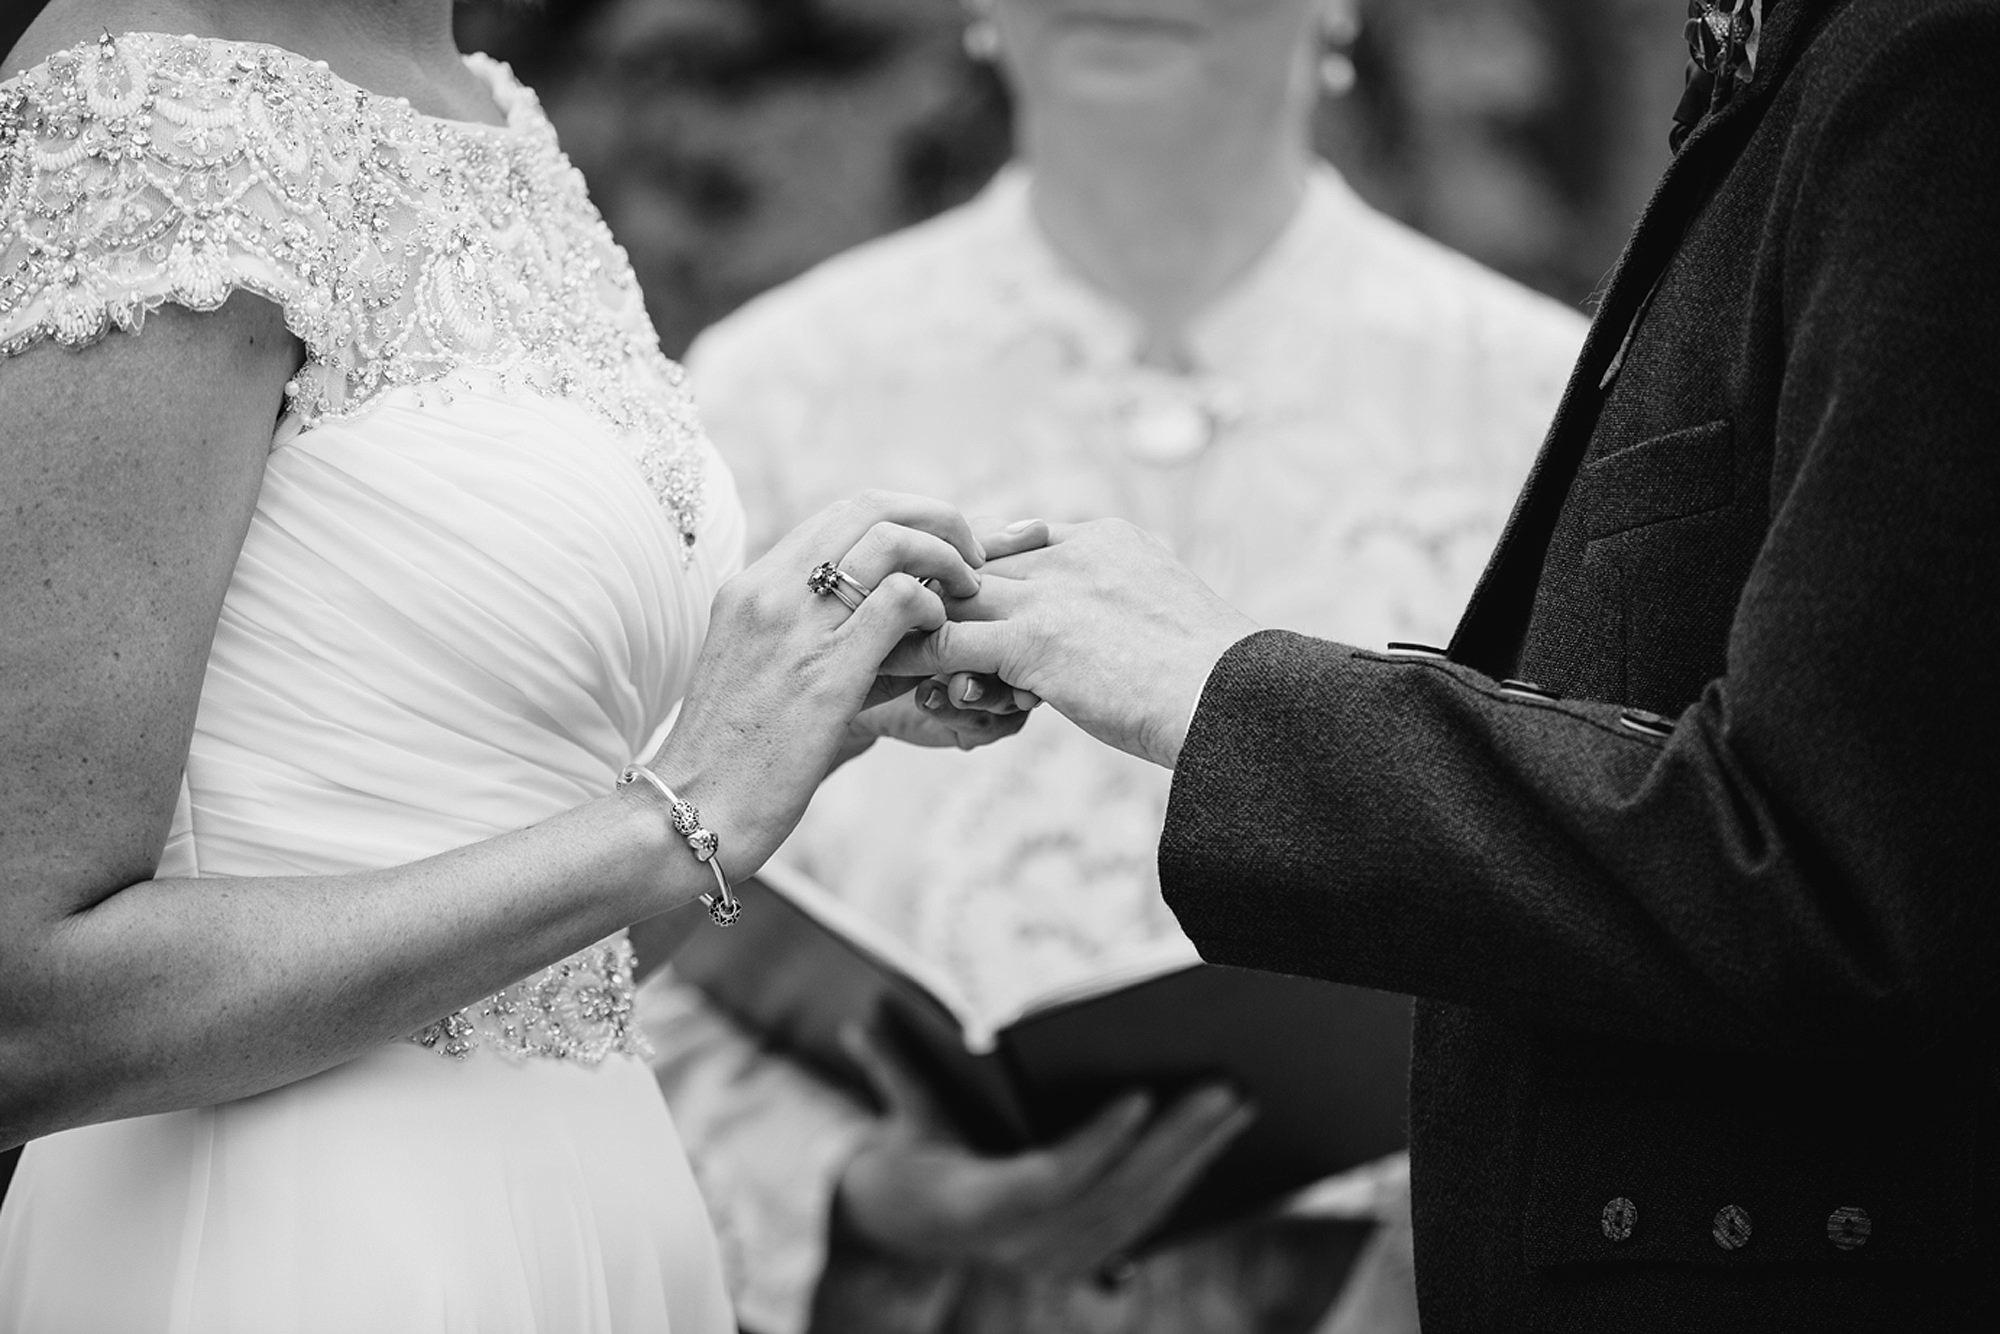 outdoor humanist wedding photography exchange of rings